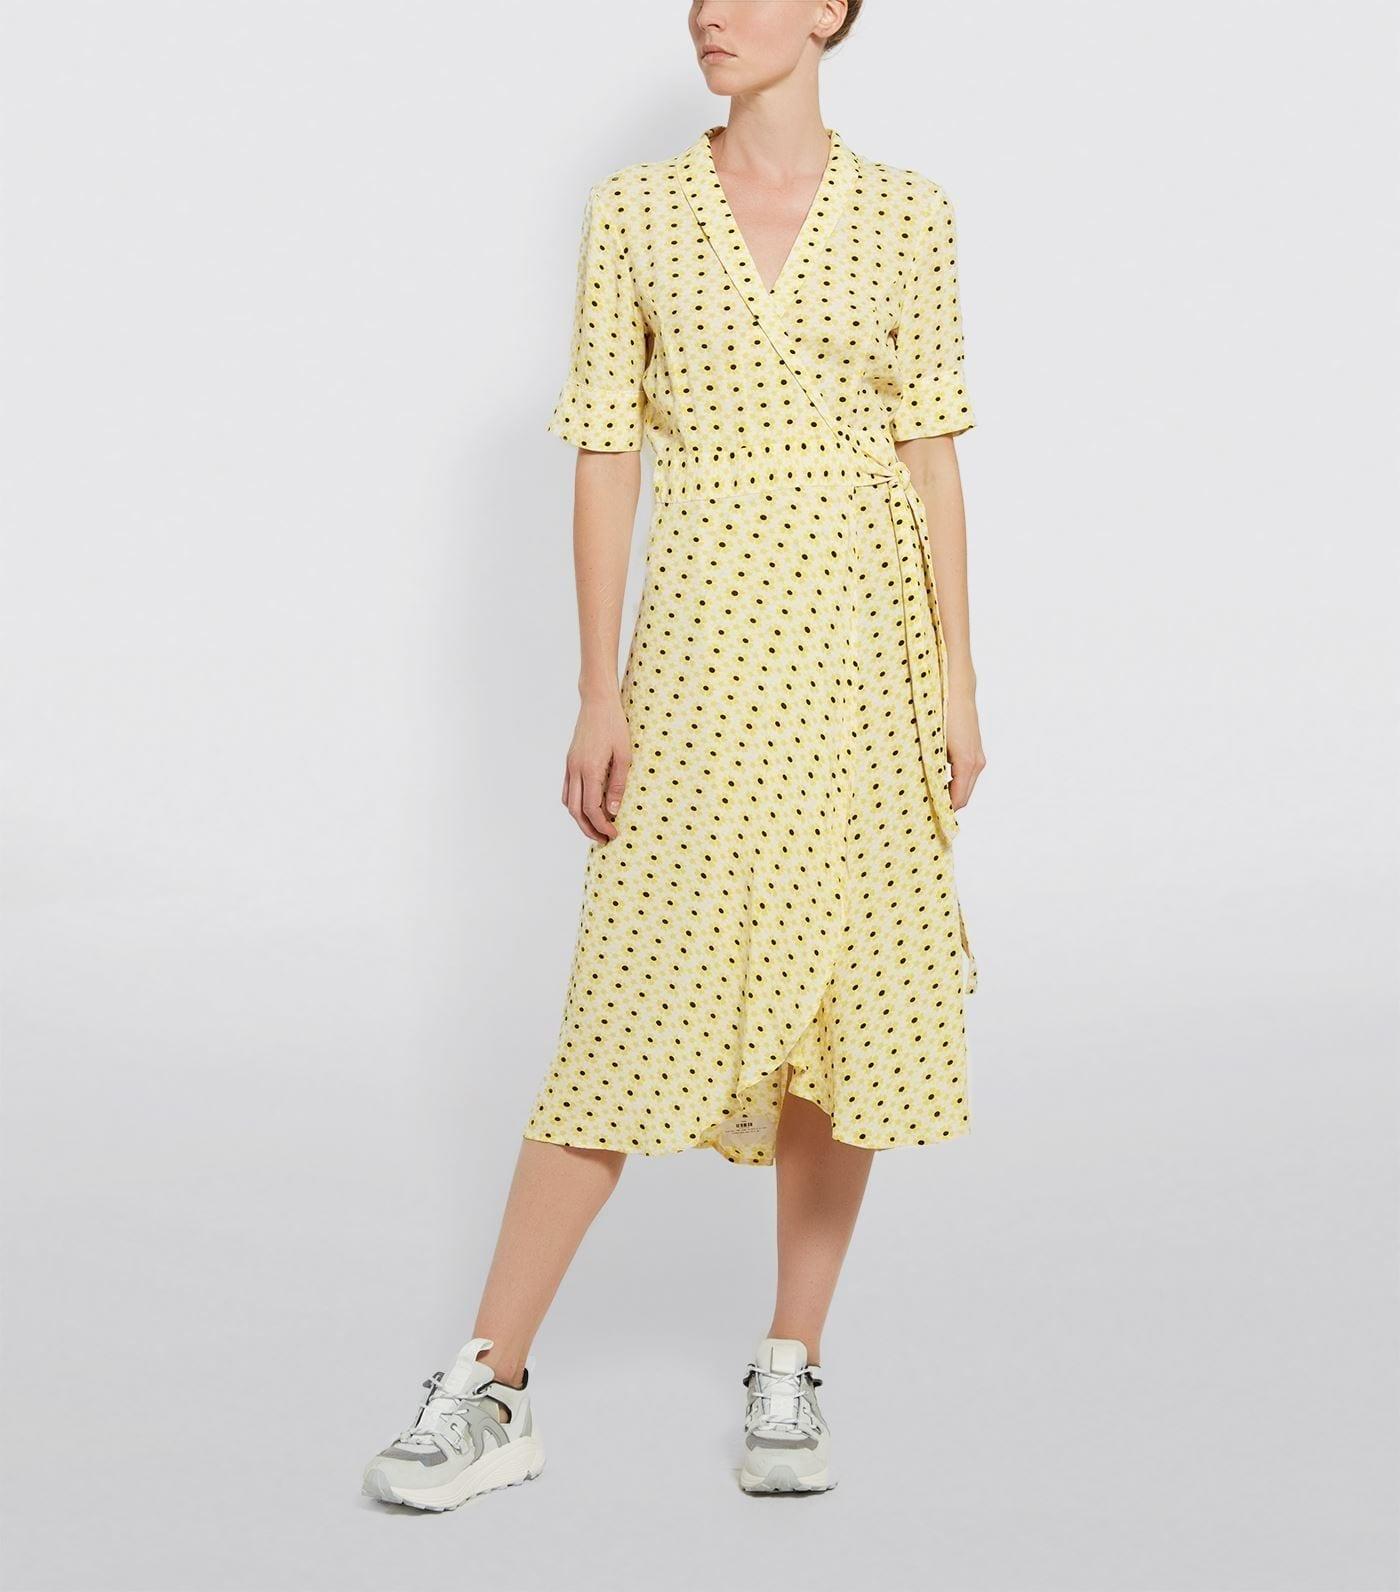 GANNI Midi Wrap Dress